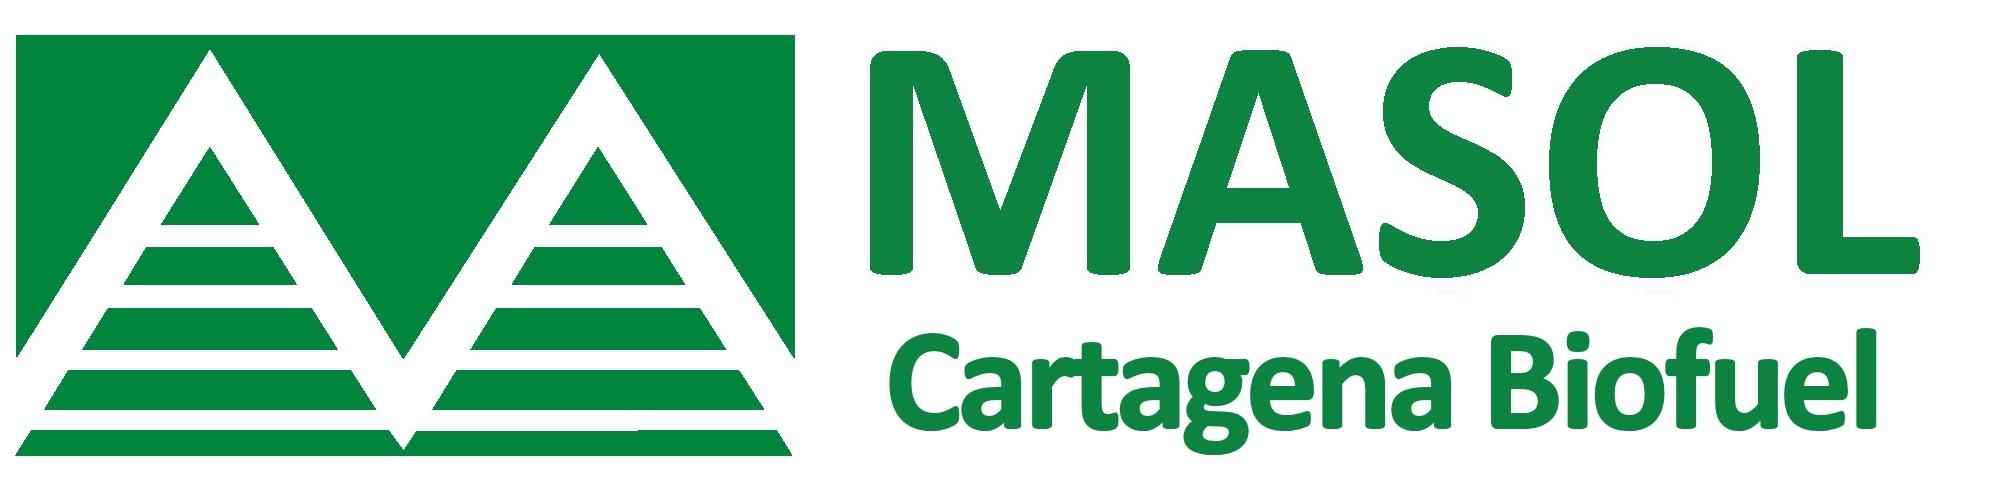 Masol Cartagena Biofuel